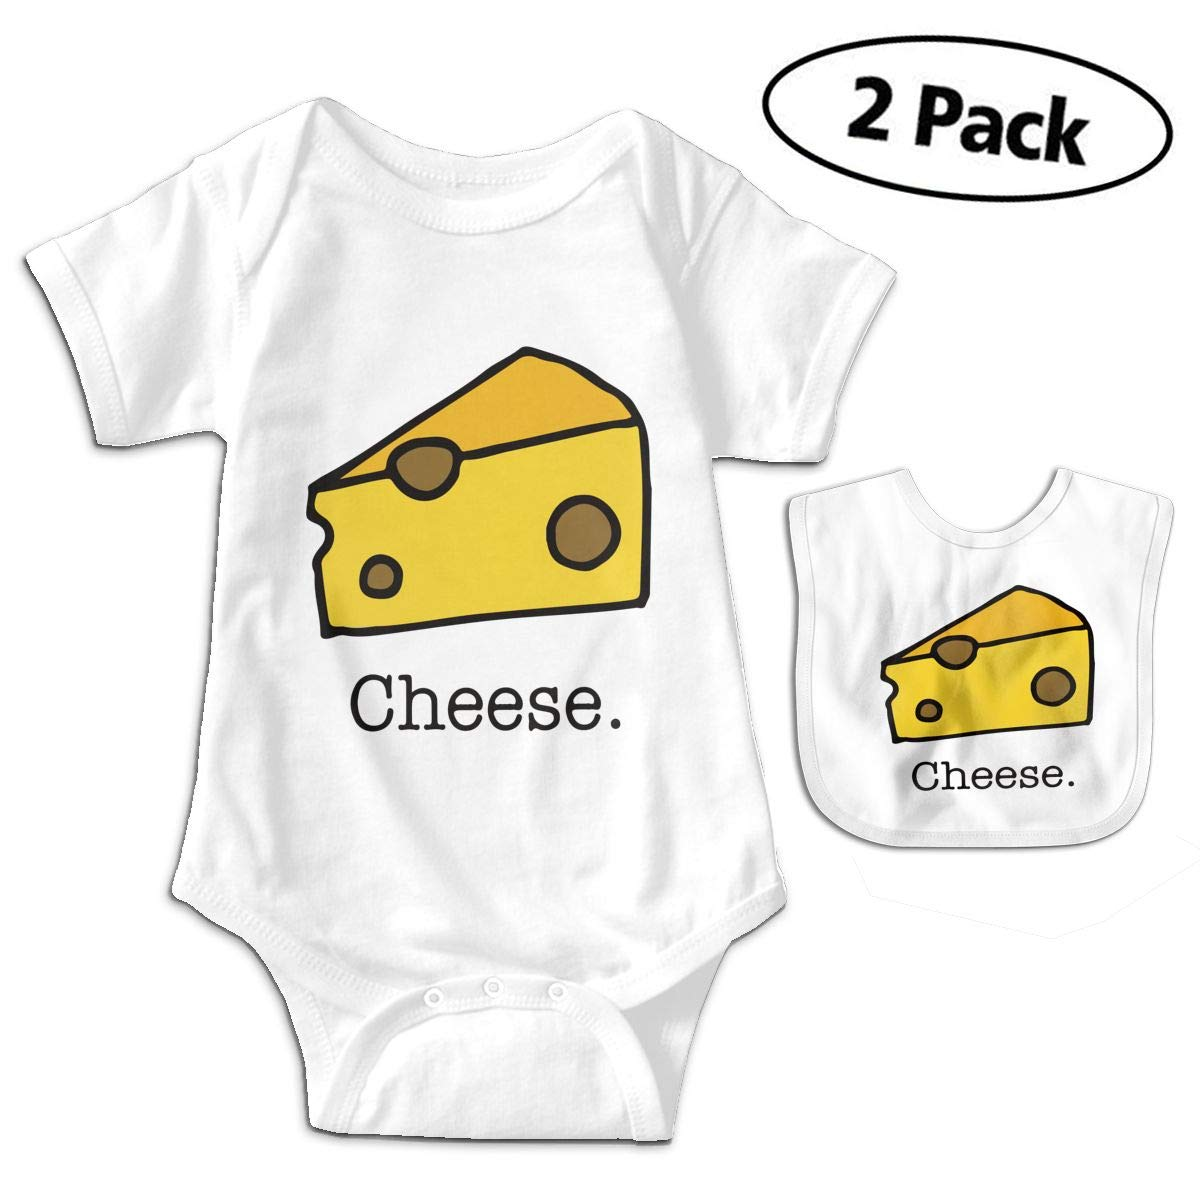 Harataki Piece of Cheese Infant Baby Short Sleeve Romper Jumpsuit Bodysuit